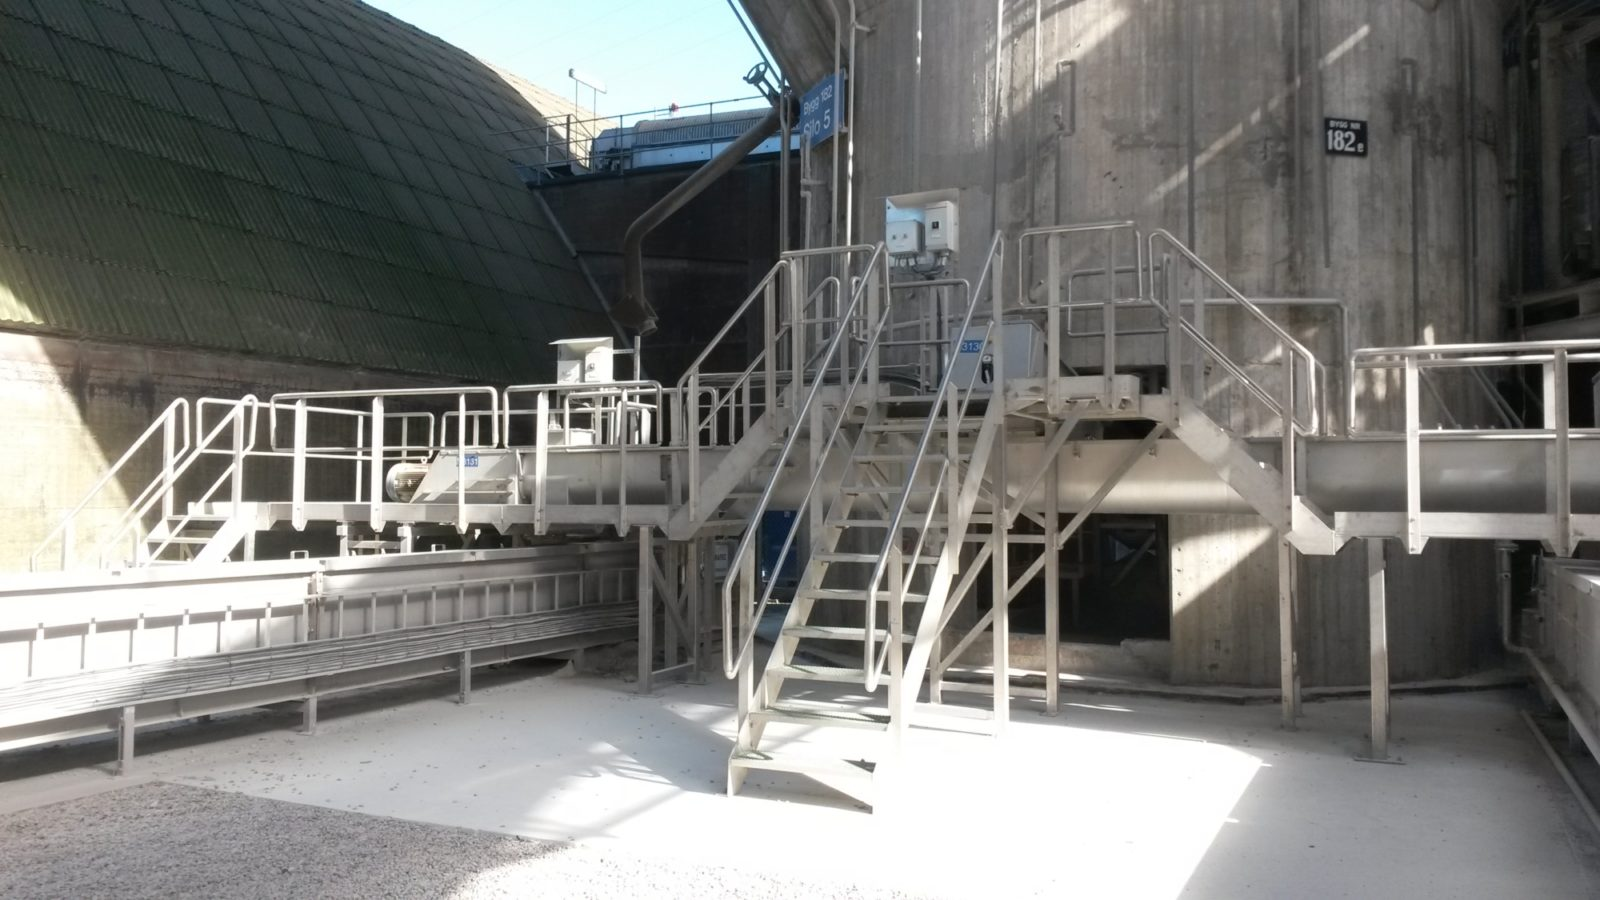 Transport system for phosphate at Yara Norway Porsgrunn